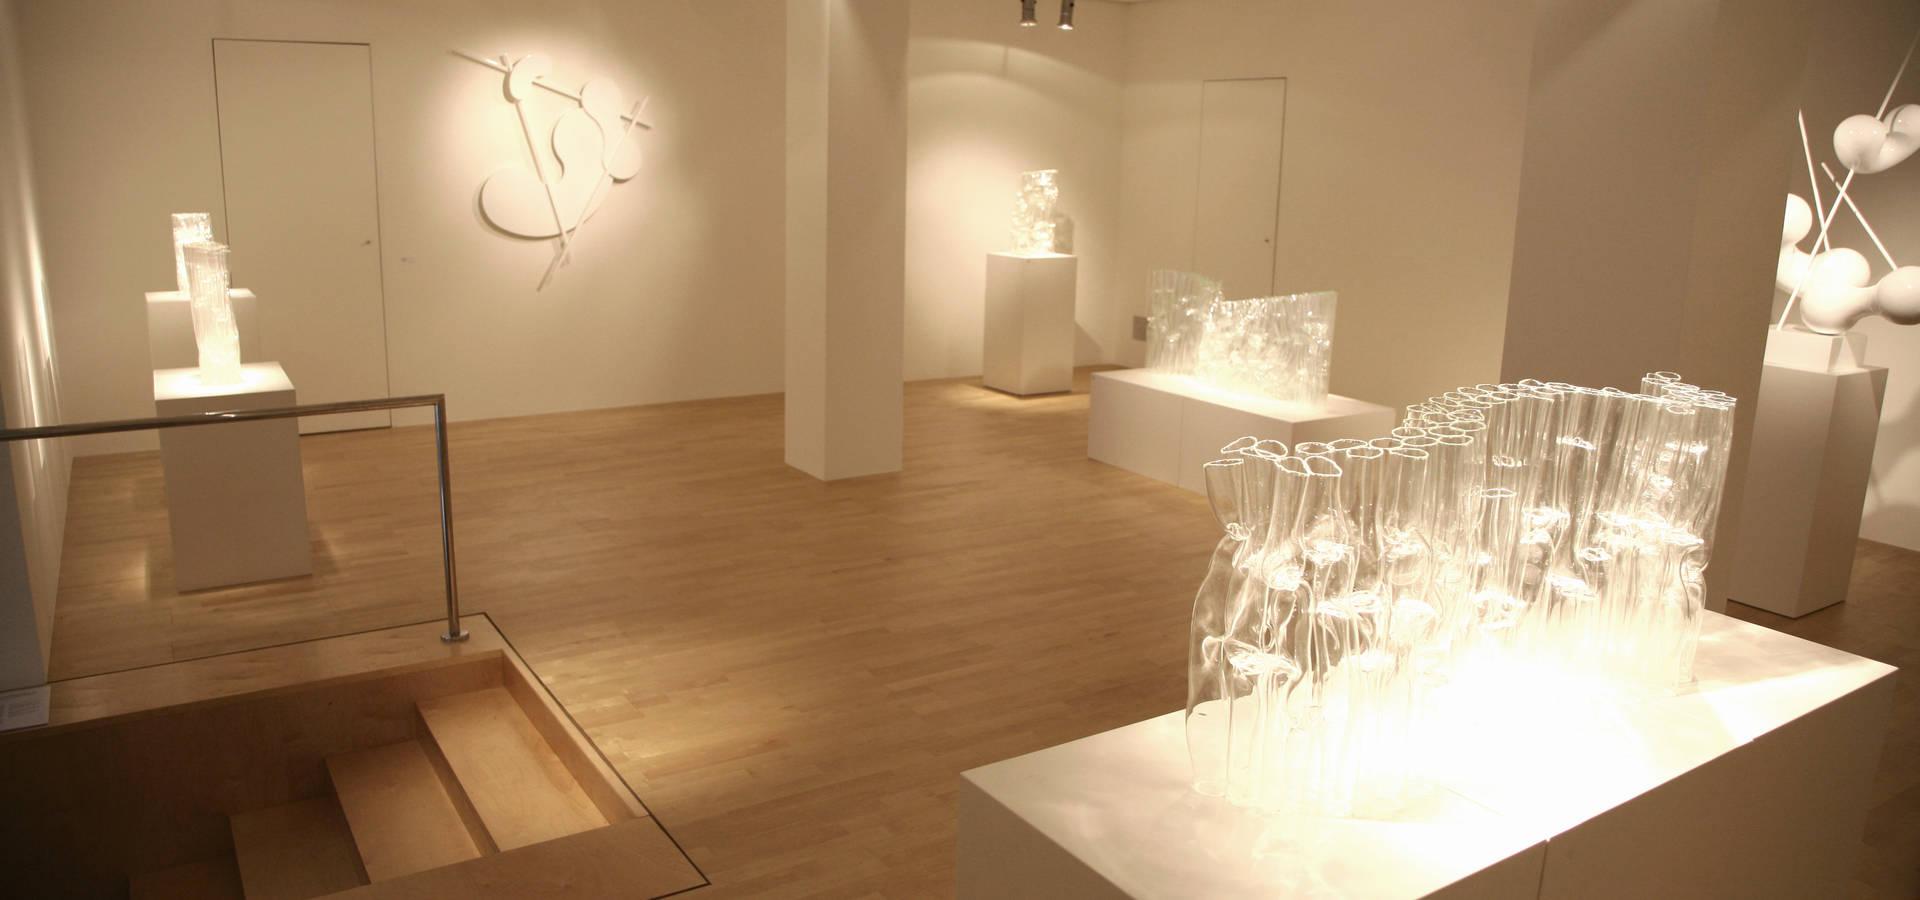 Architektur & Interior Design